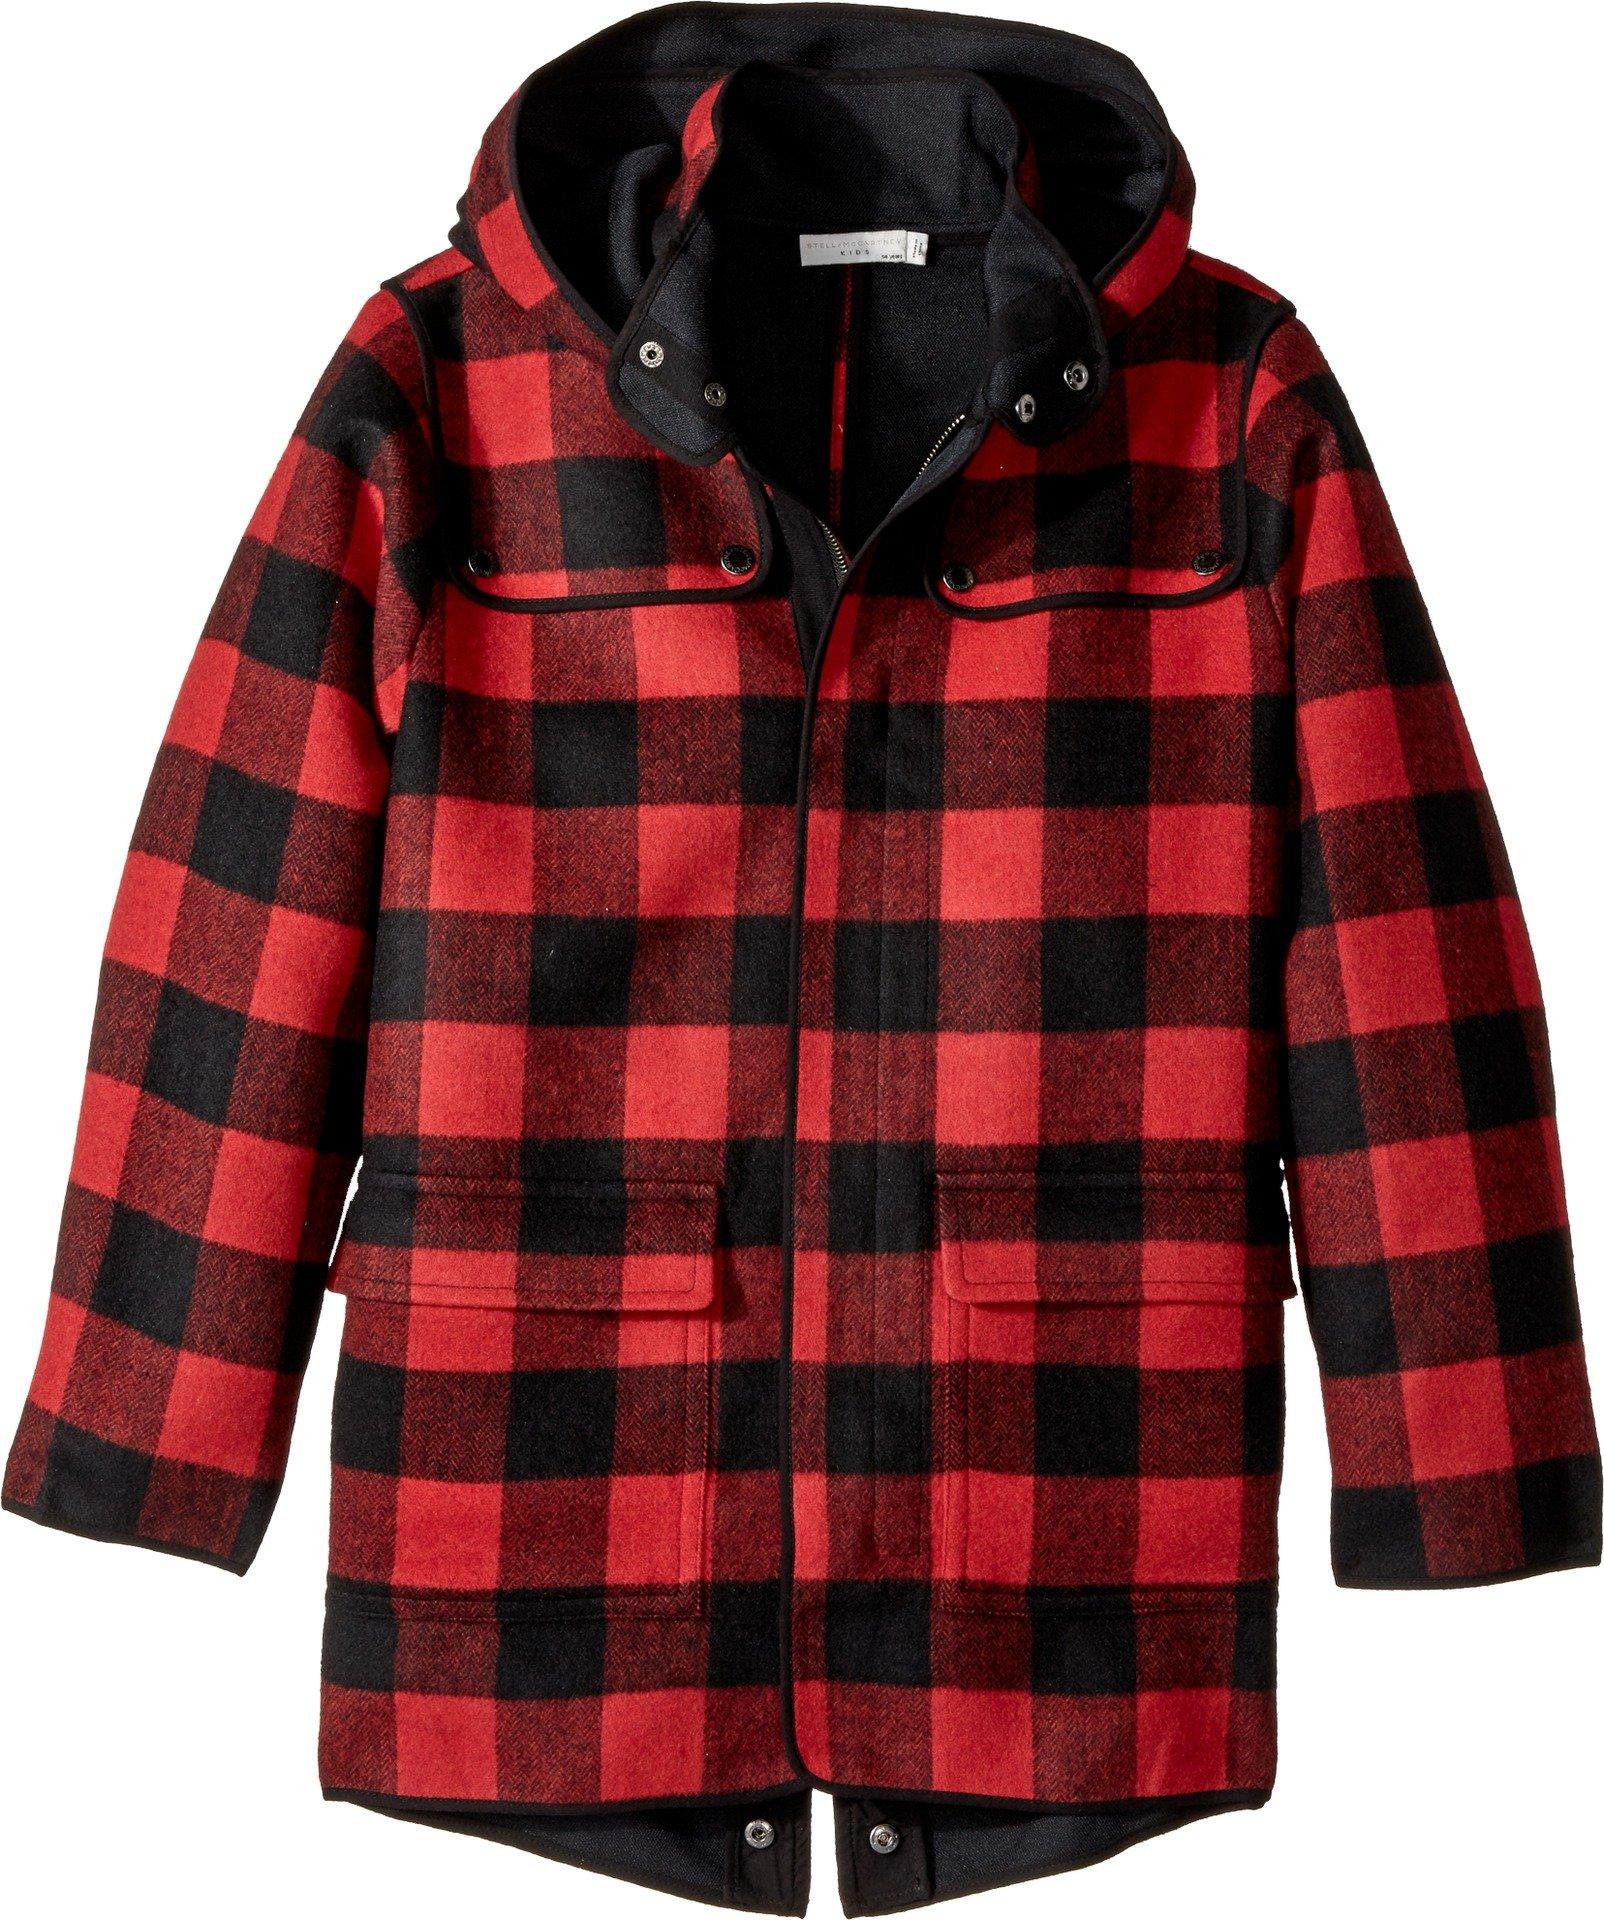 Stella McCartney Kids  Baby Boy's Beet Checkered Wool Coat w/ Detachable Hood (Toddler/Little Kids/Big Kids) Red/Black 12 (Big Kids)